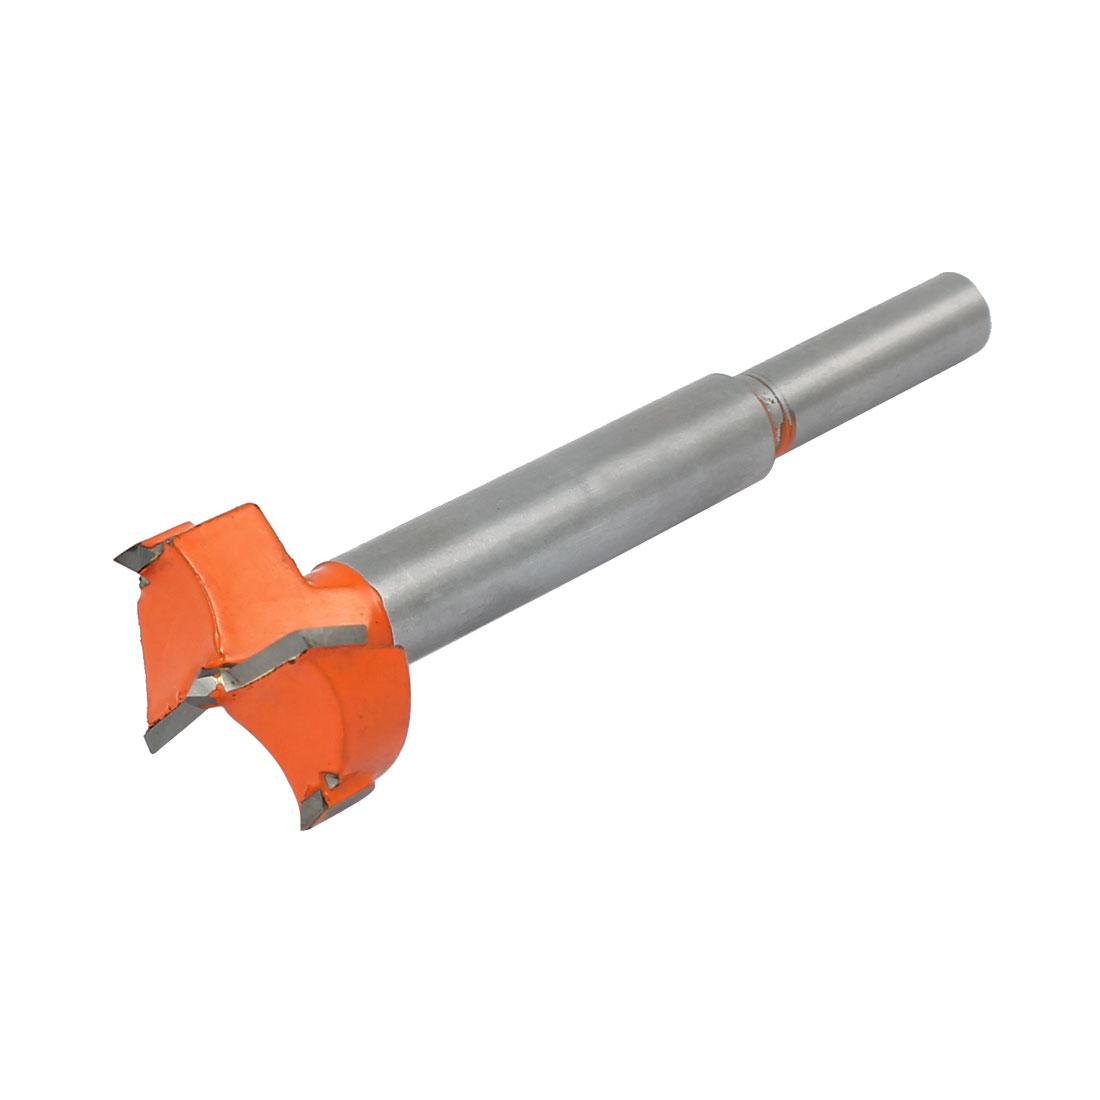 25mm Dia Carbide Tip Wood Drilling Cutting Hinge Boring Bit Drill Tool Orange